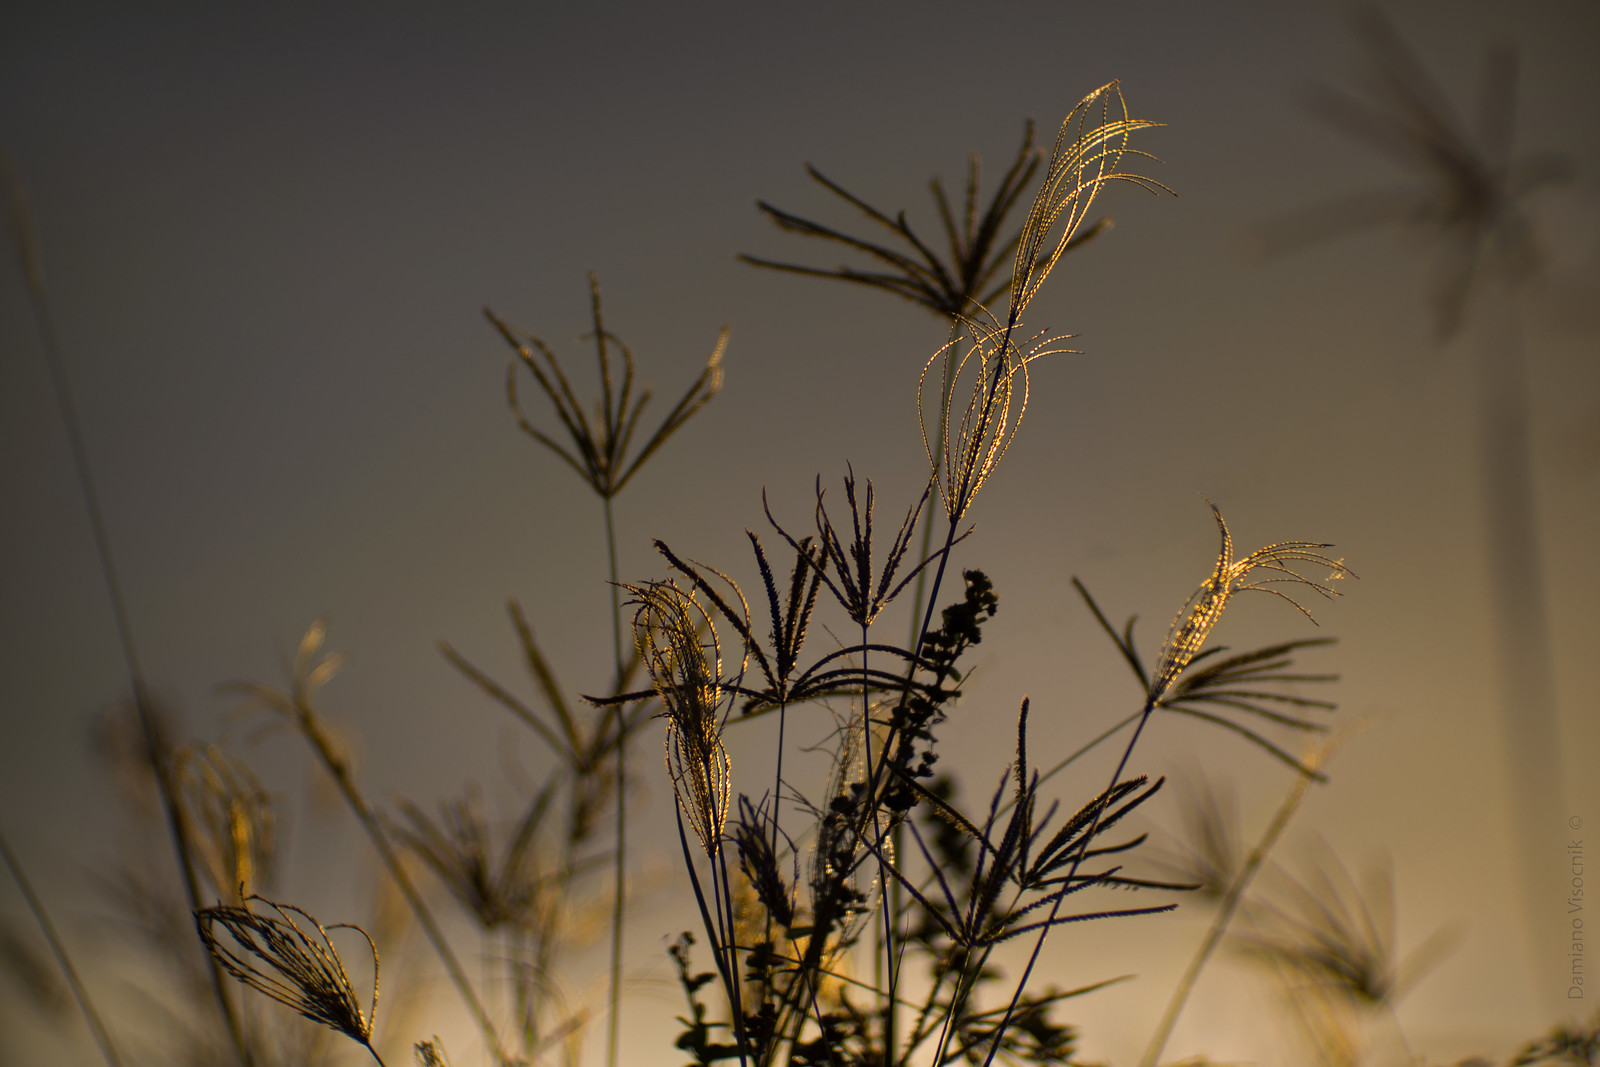 golden filigree